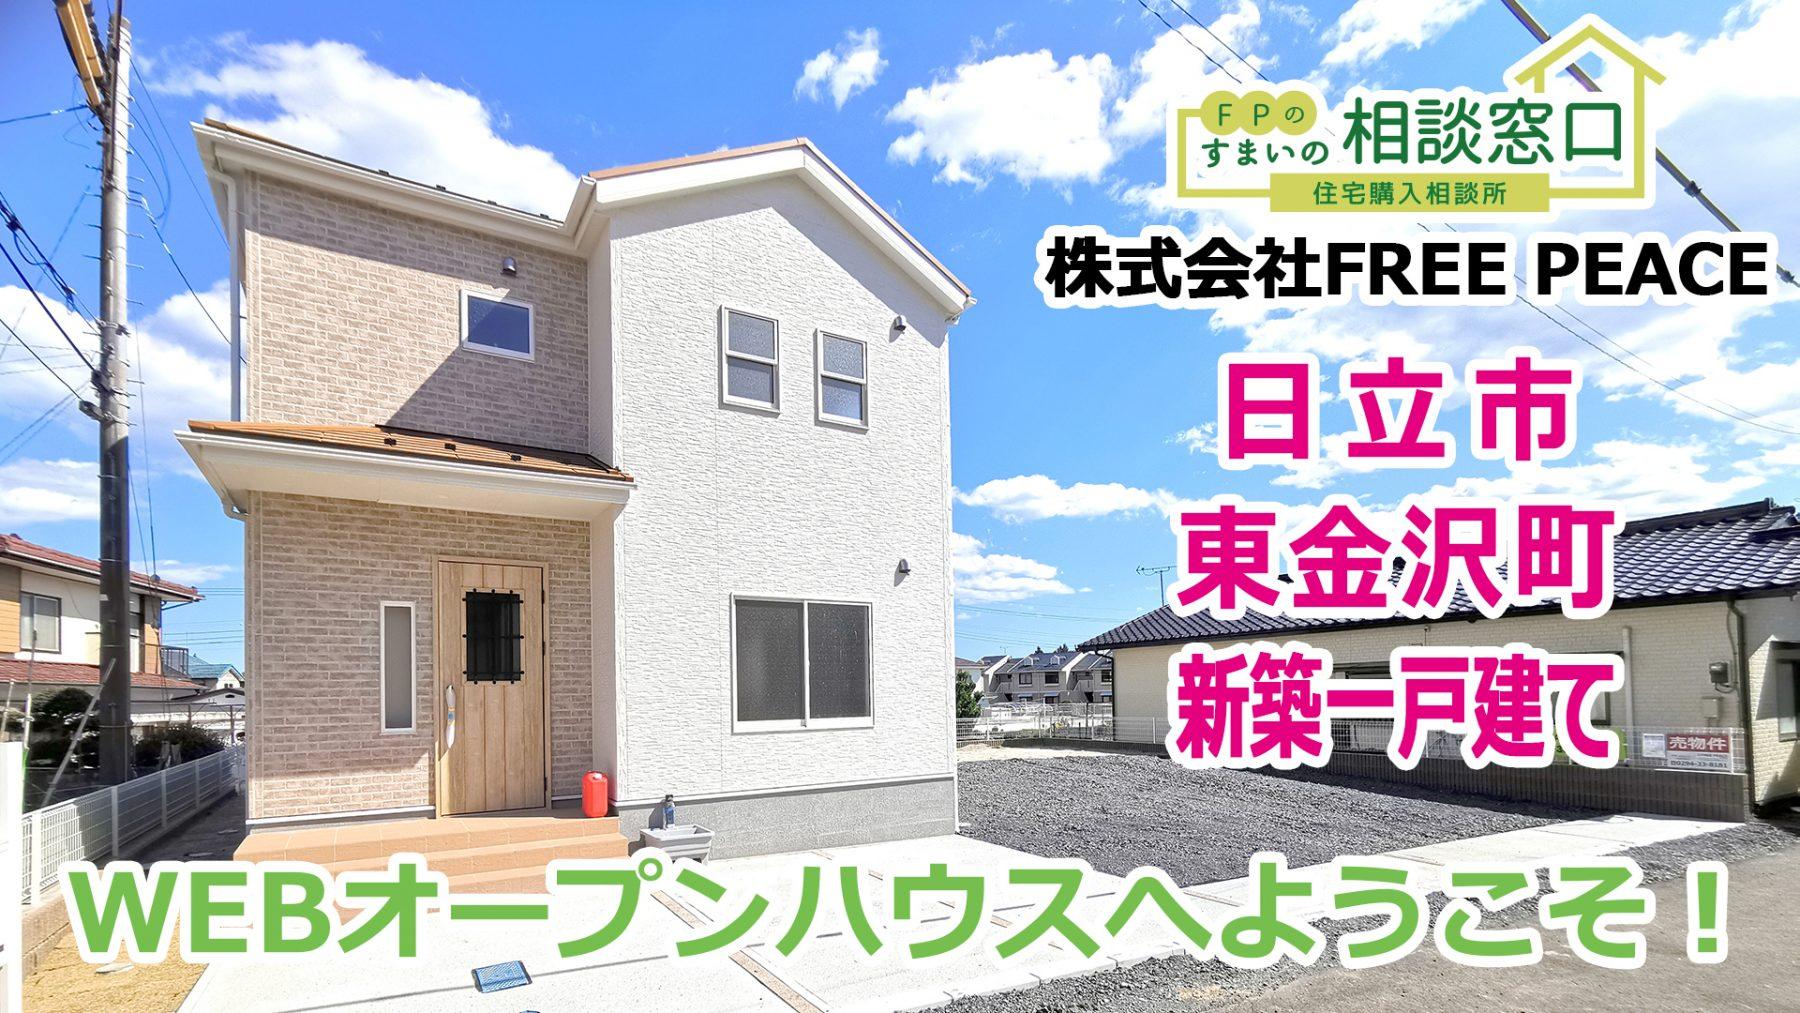 WEBオープンハウス♪東金沢町新築♪